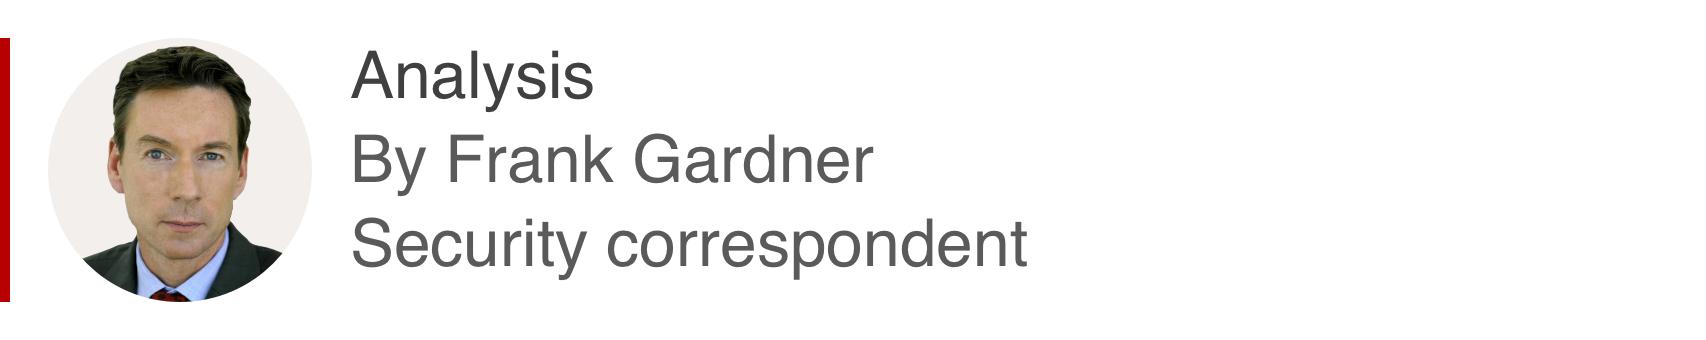 Analysis box by Frank Gardner, security correspondent